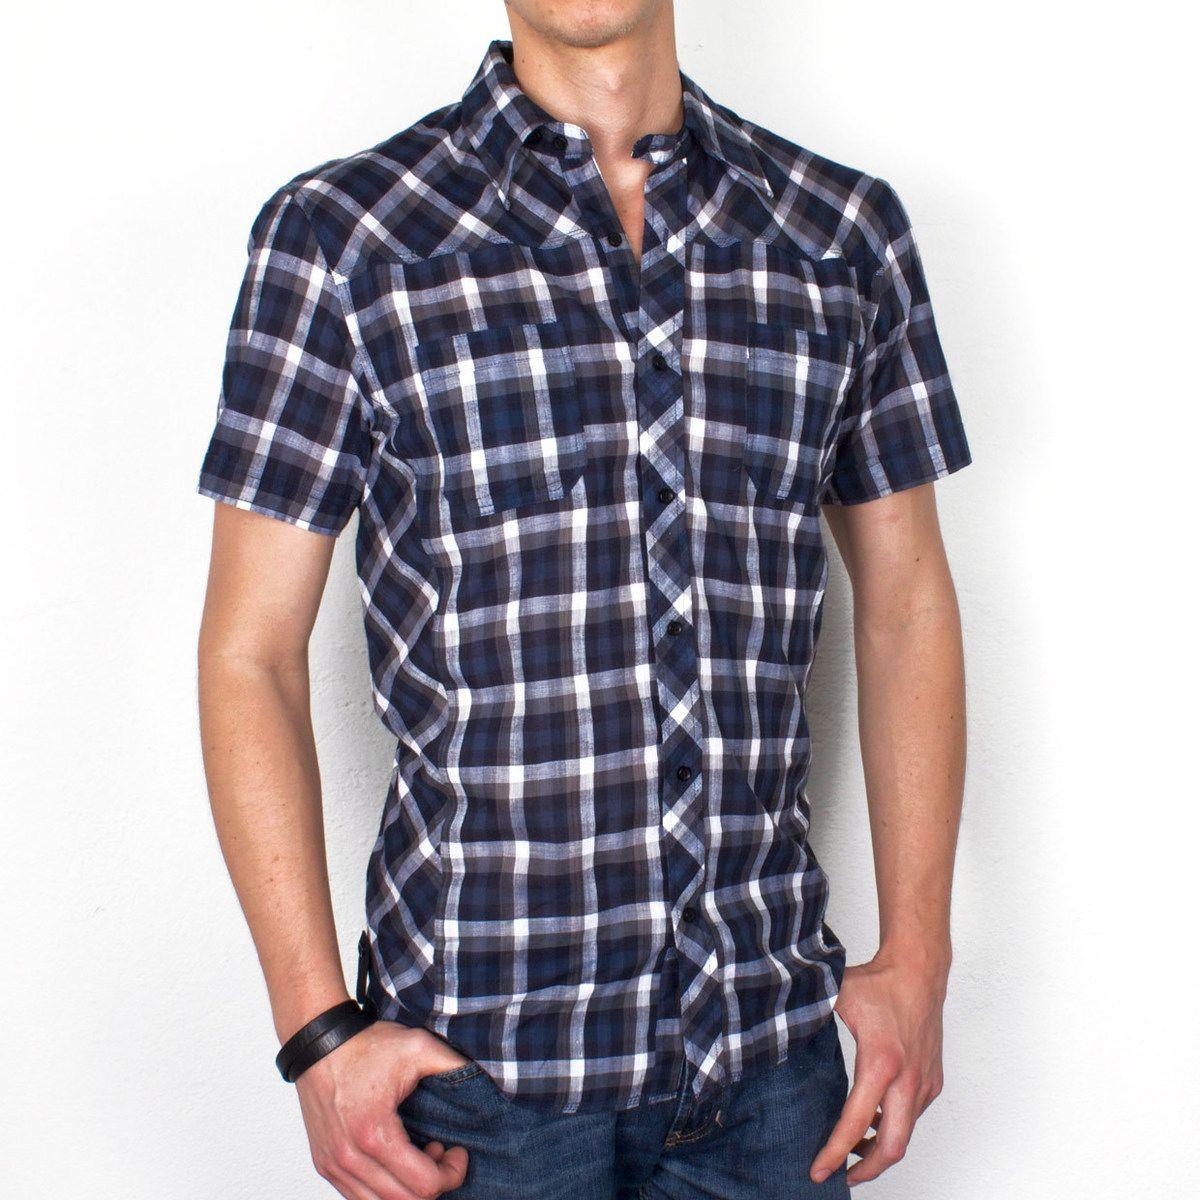 Roy Shirt Gray/Navy Check